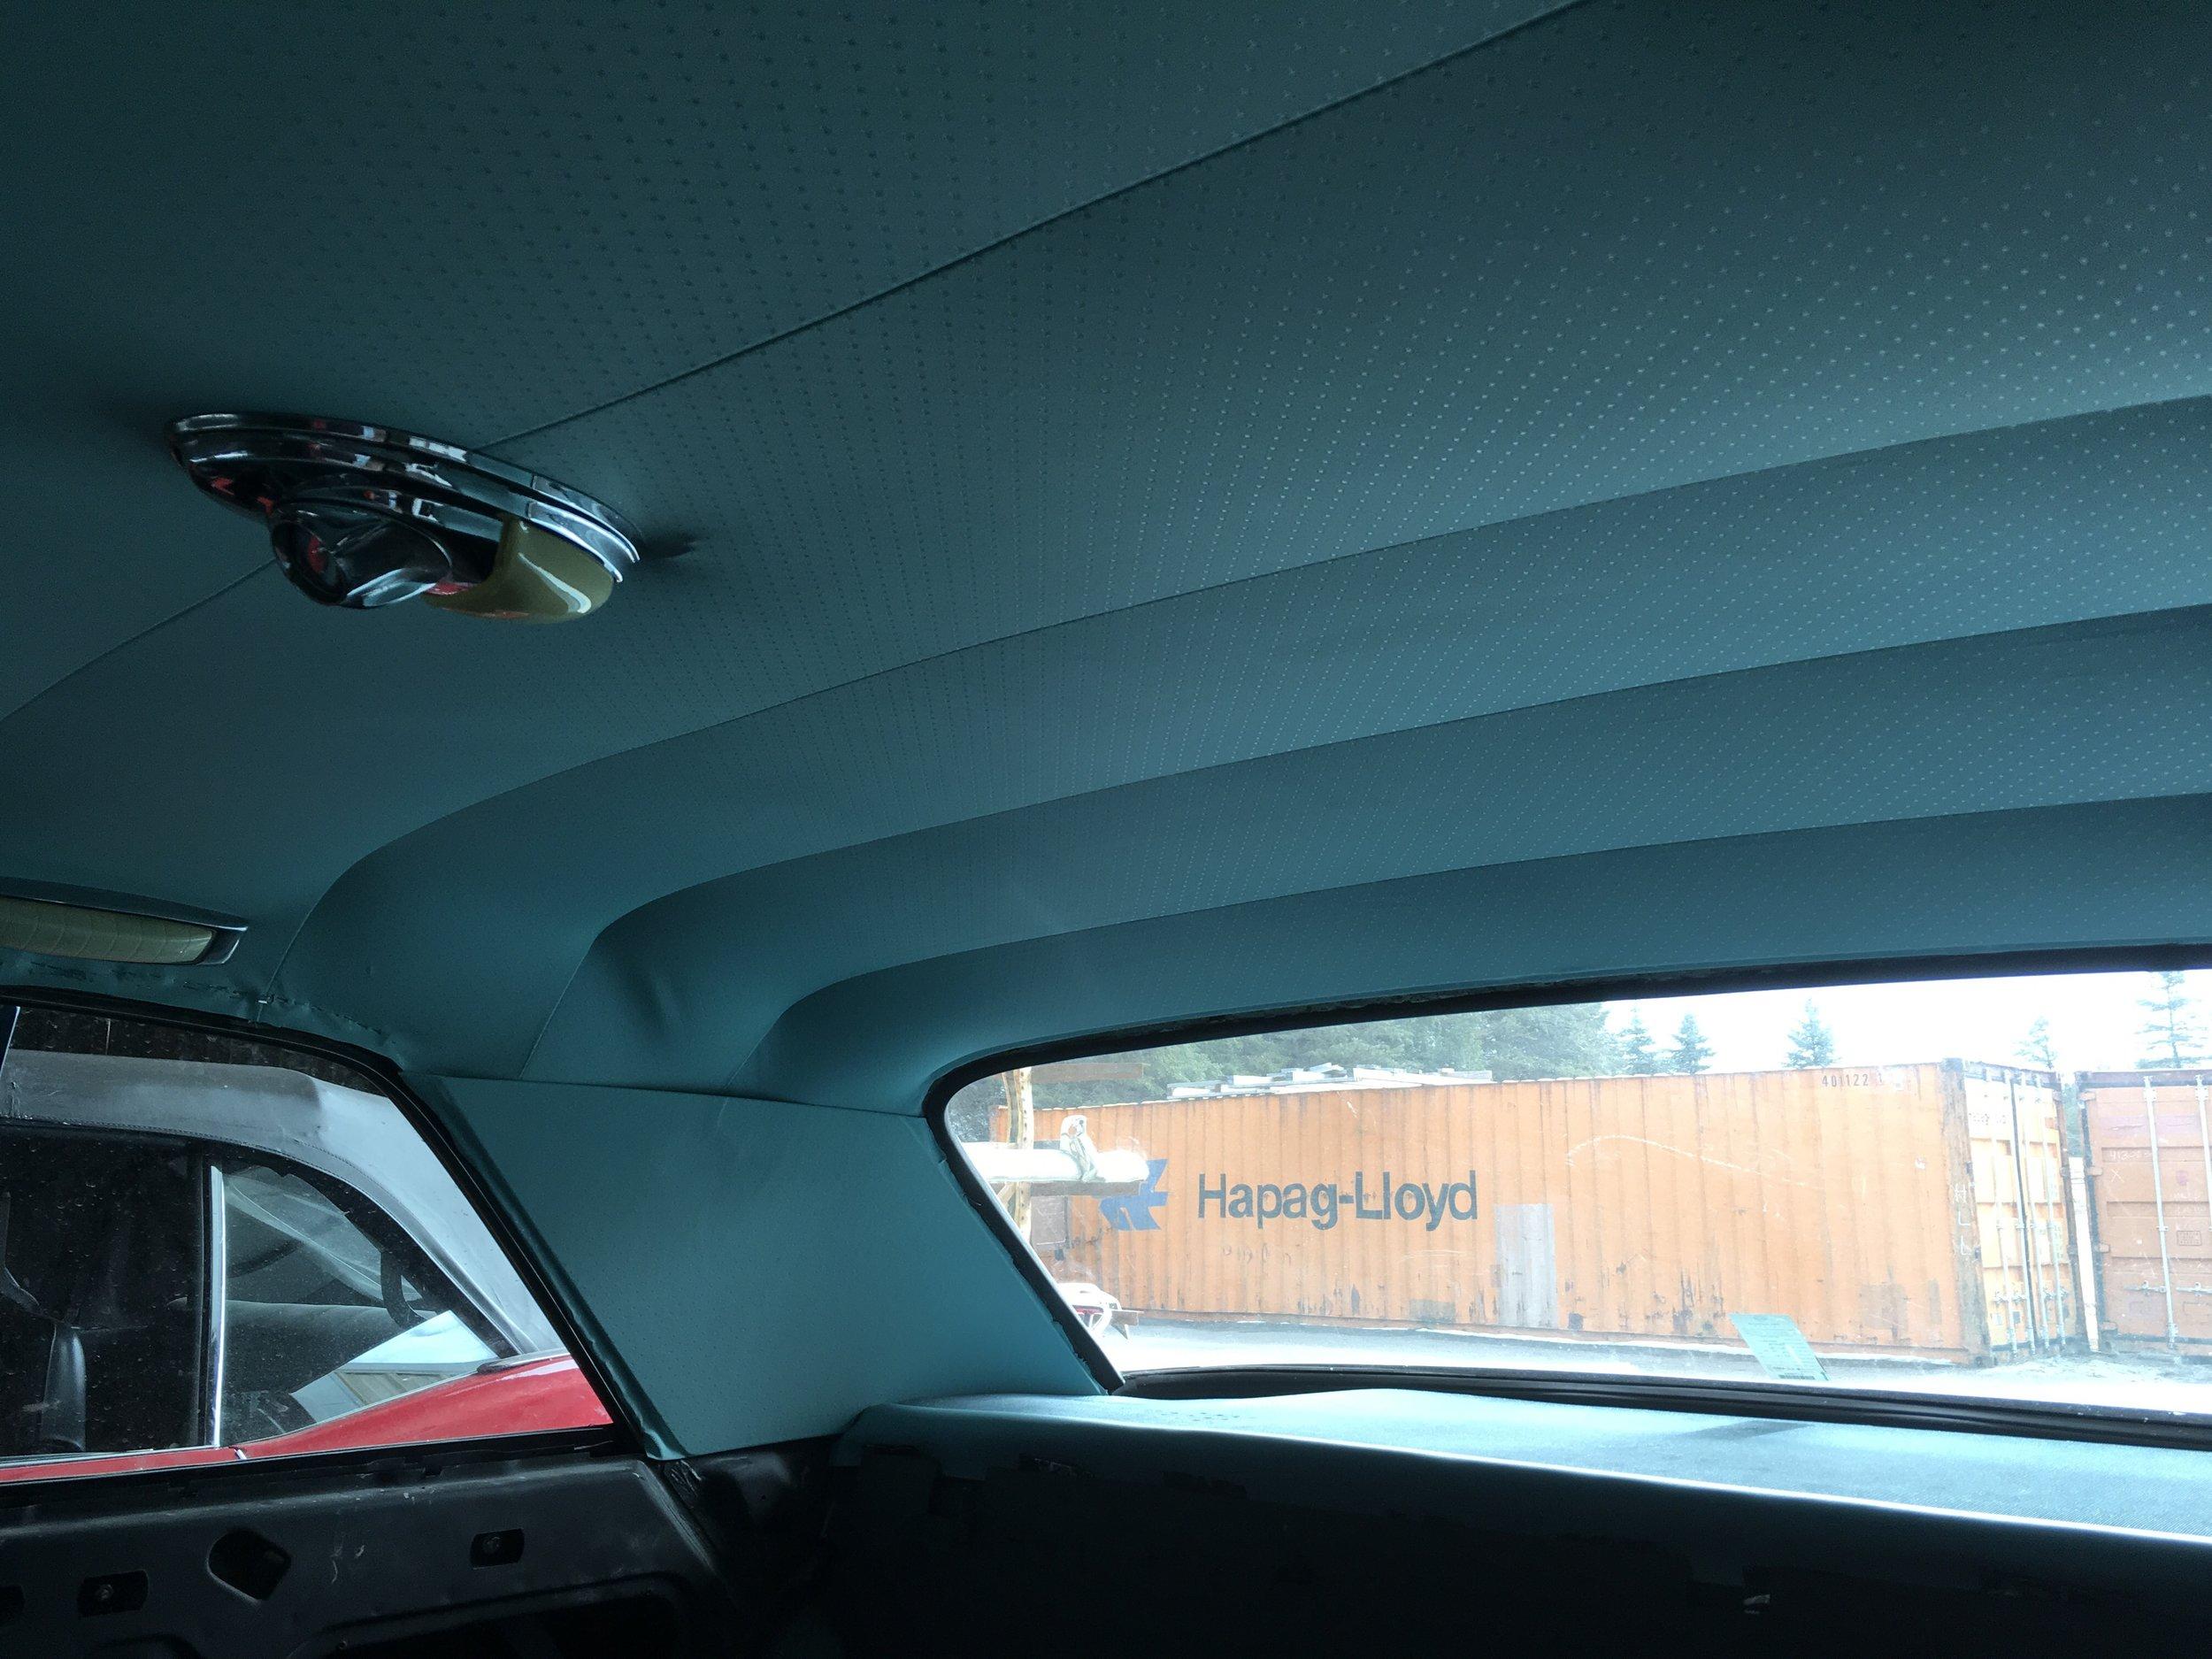 1962-Pontiac-Bonn-minneapolis-hot-rod-custom-build-restoration-45.jpg